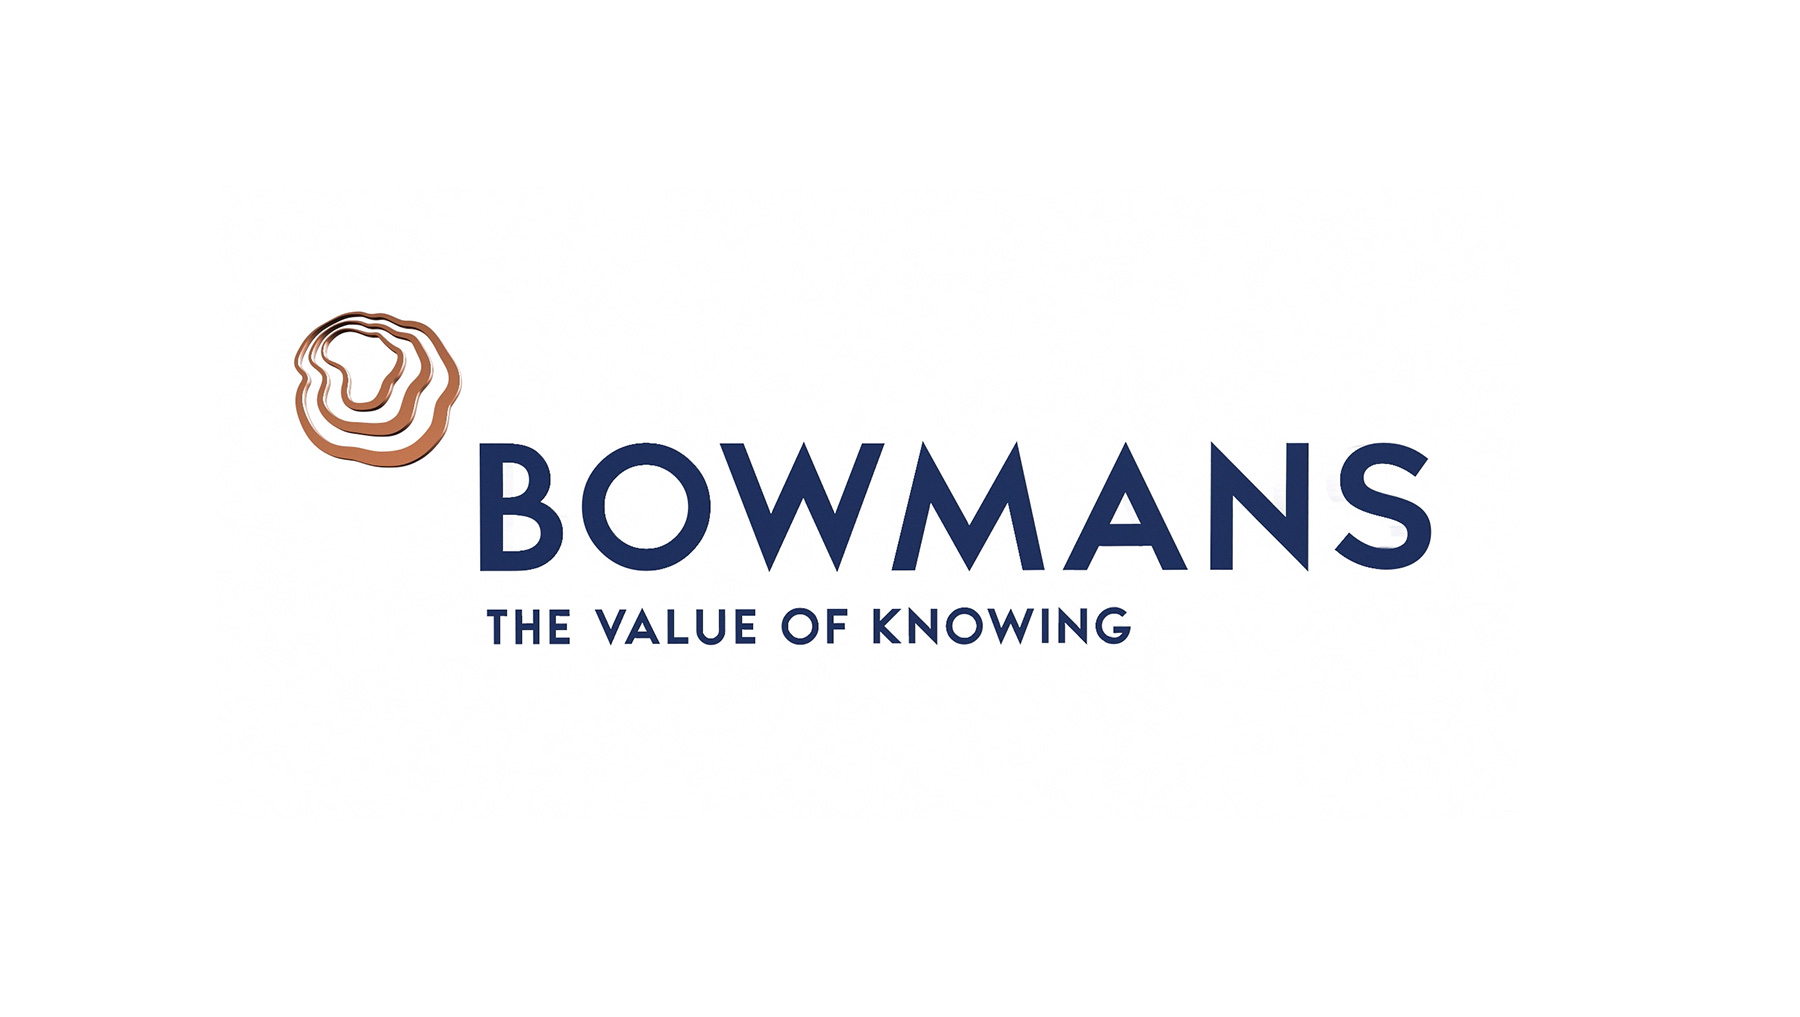 BOWMANS_REBRAND_LargeImage_2.jpg